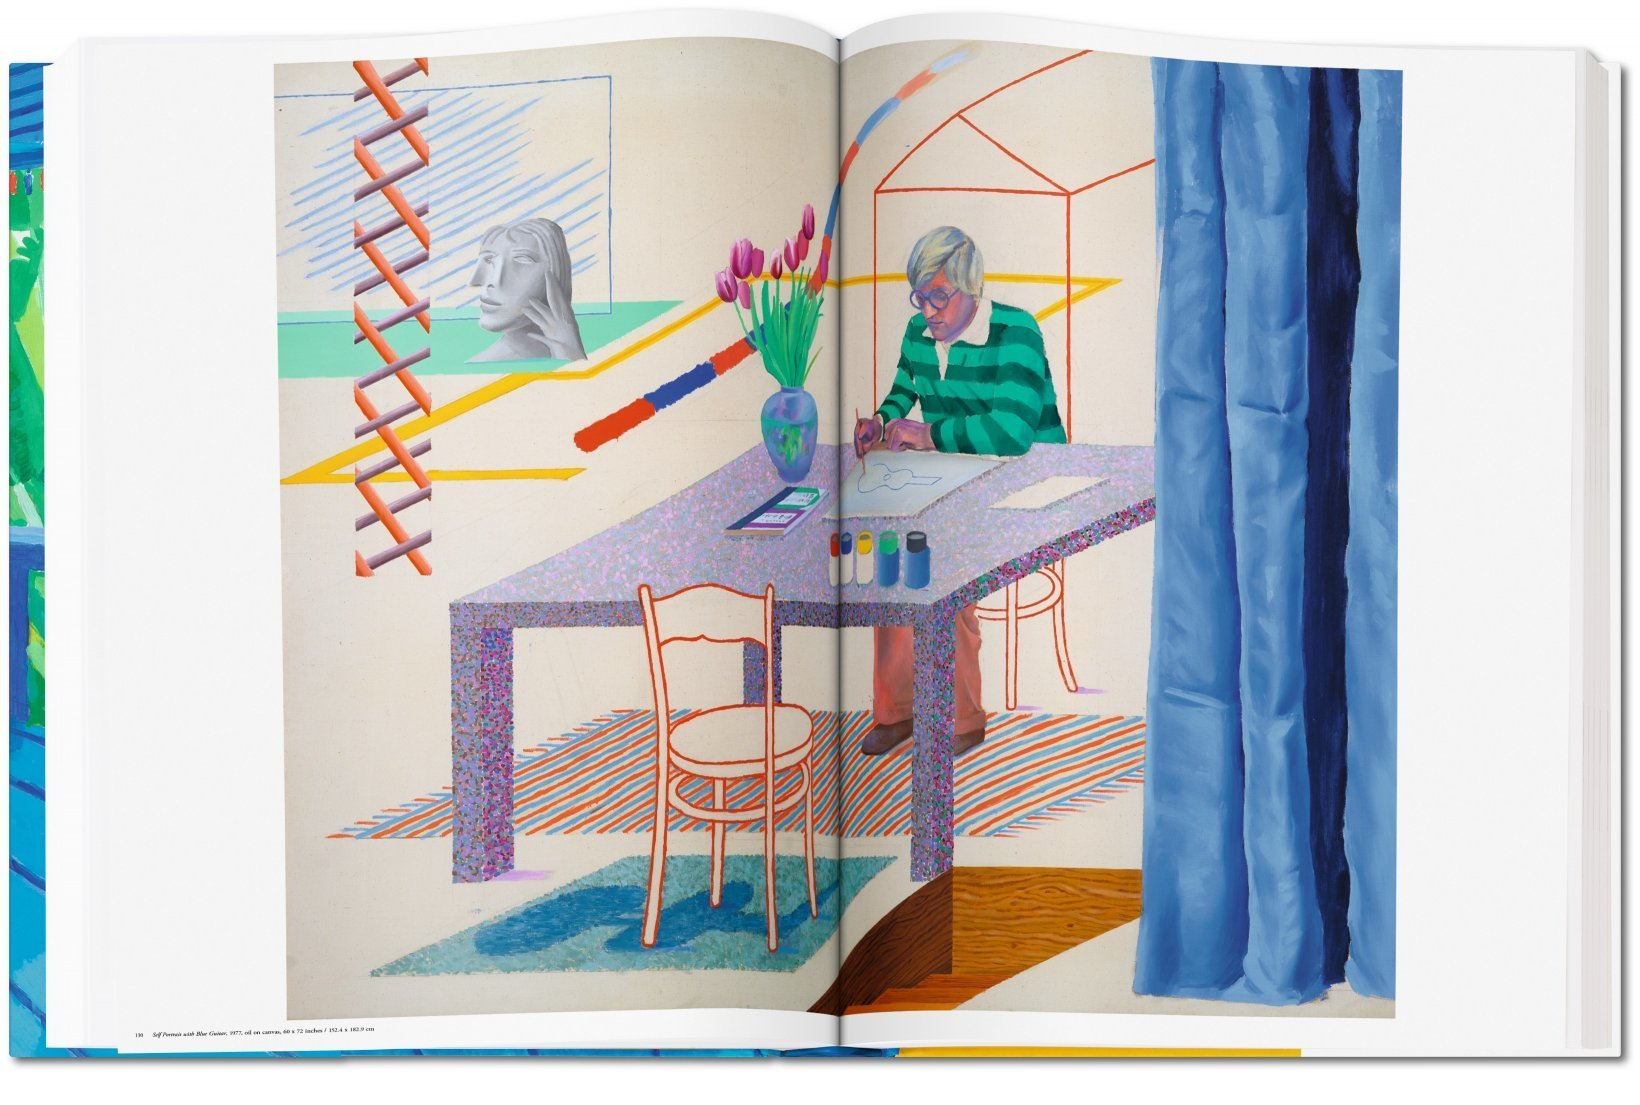 Interior de 'A Bigger Book' - Cortesía: Taschen